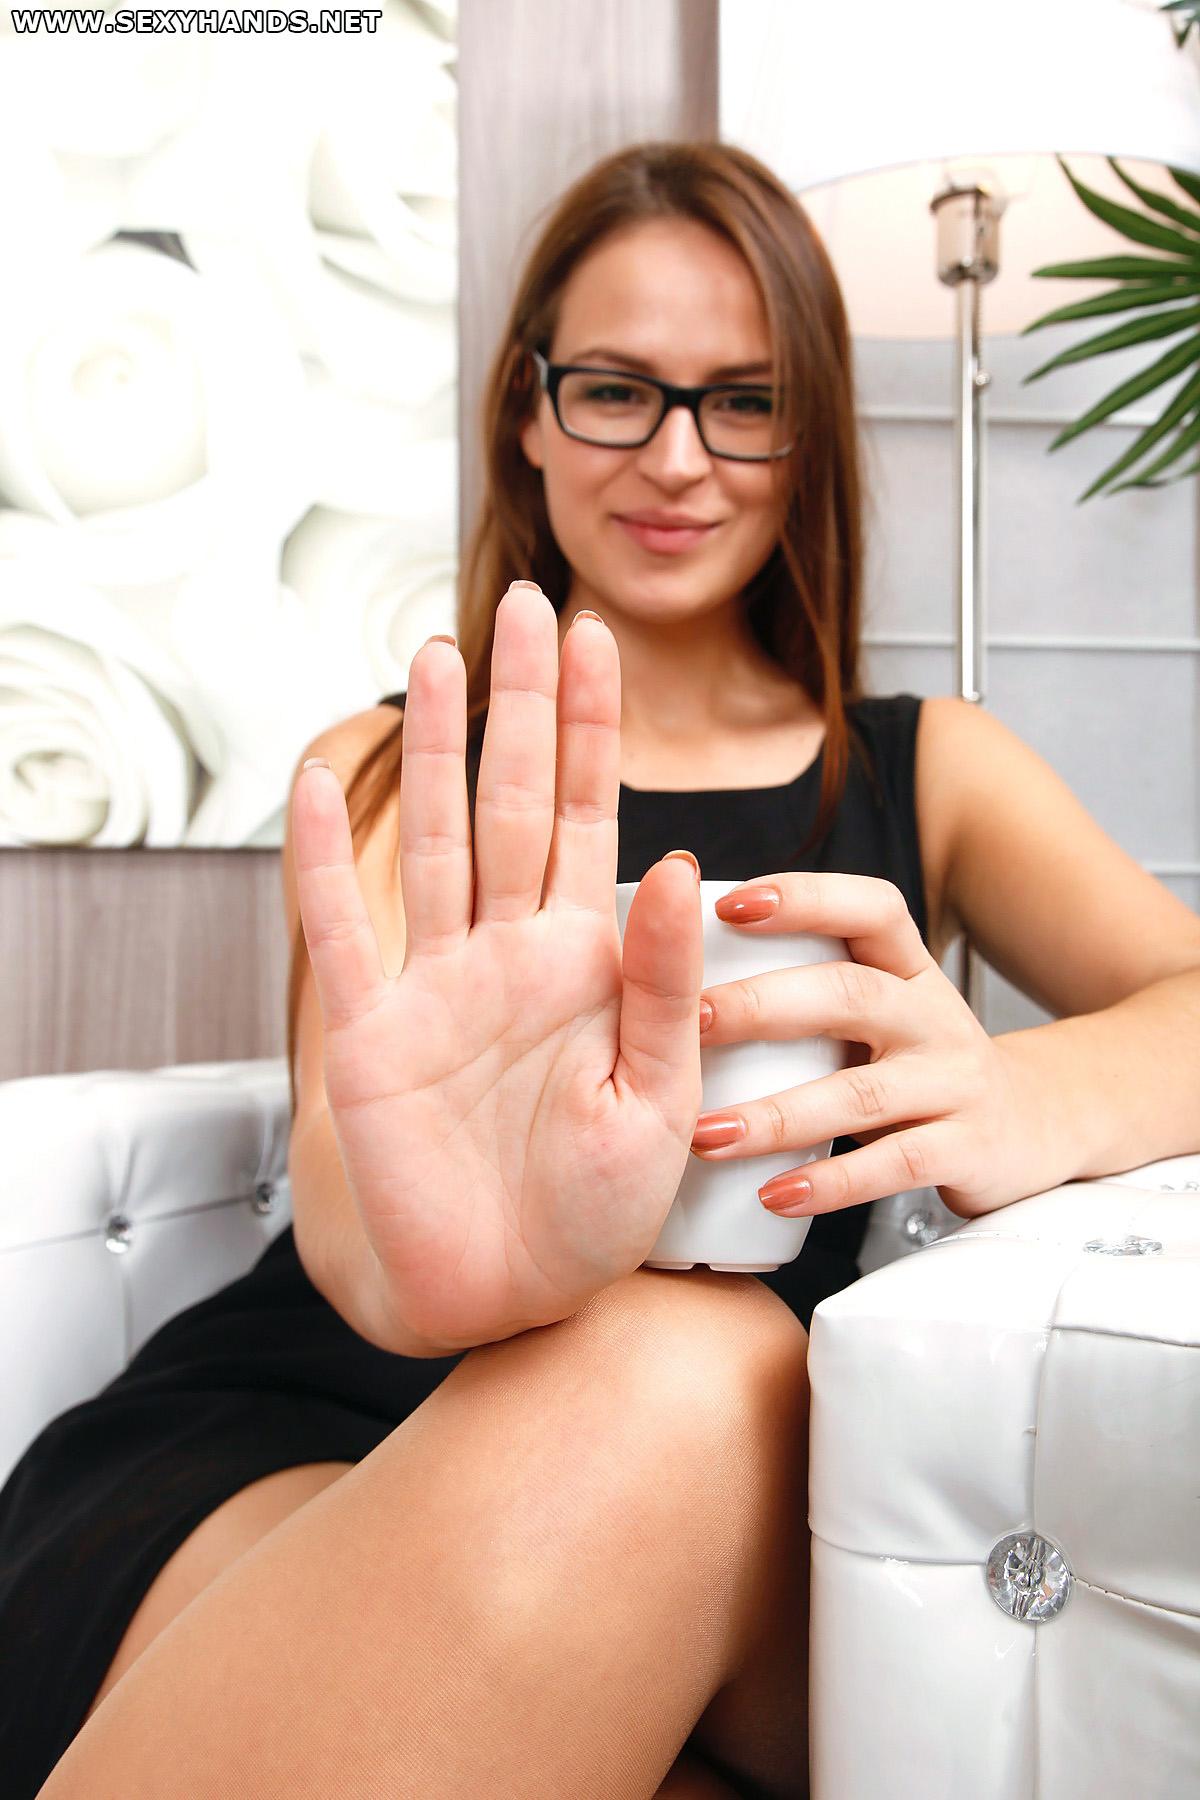 Hand Fetish Pics 19